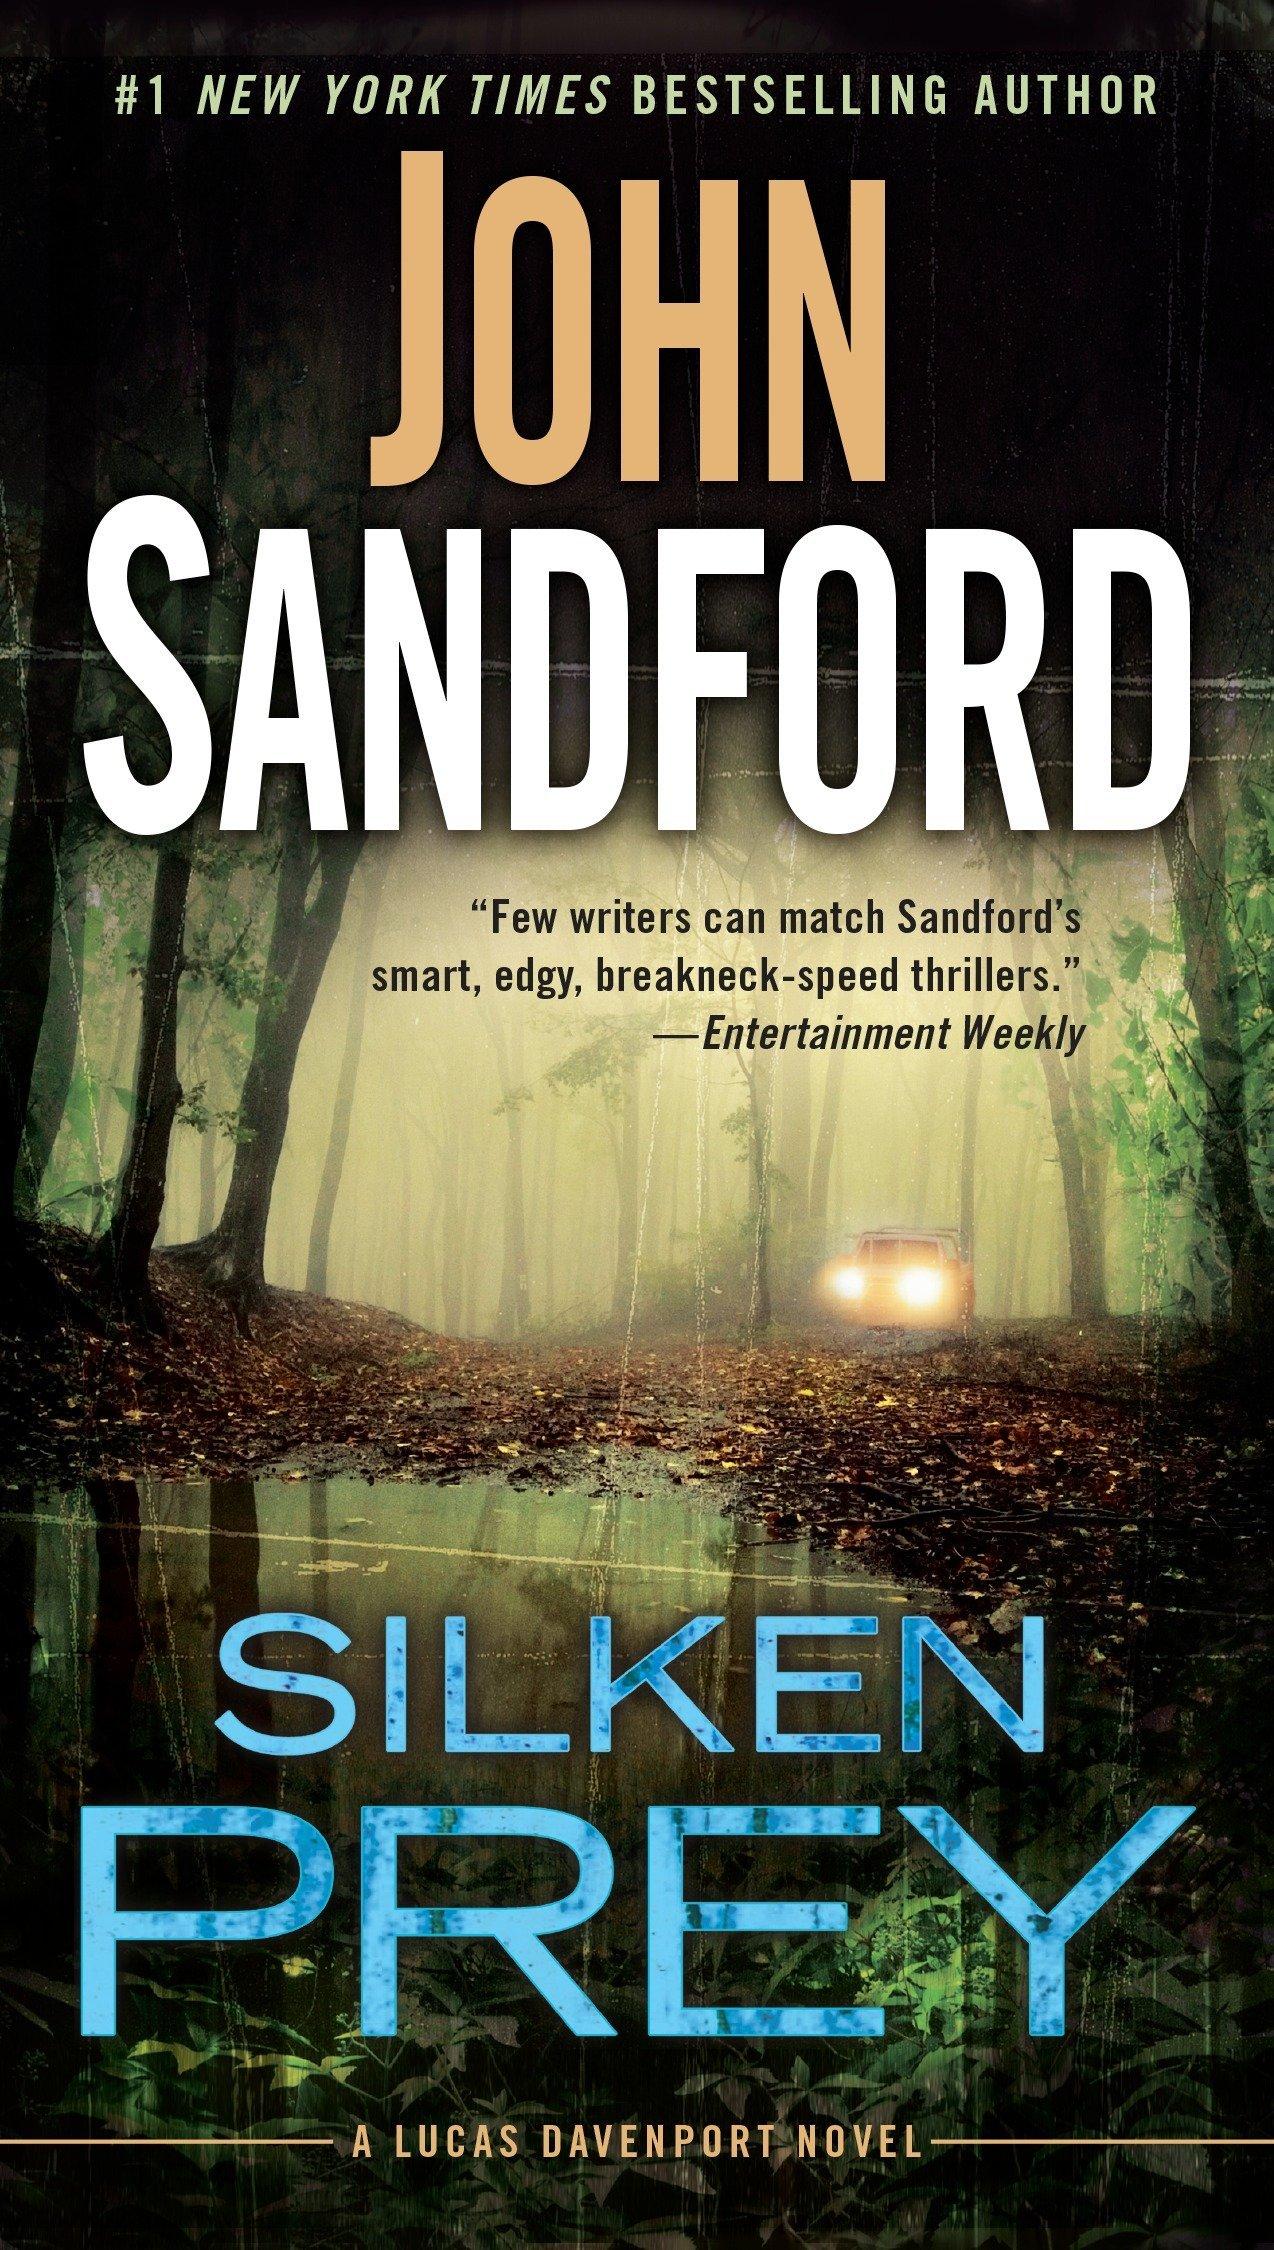 Silken Prey A Lucas Davenport Novel John Sandford 9780425267769 Amazon Books